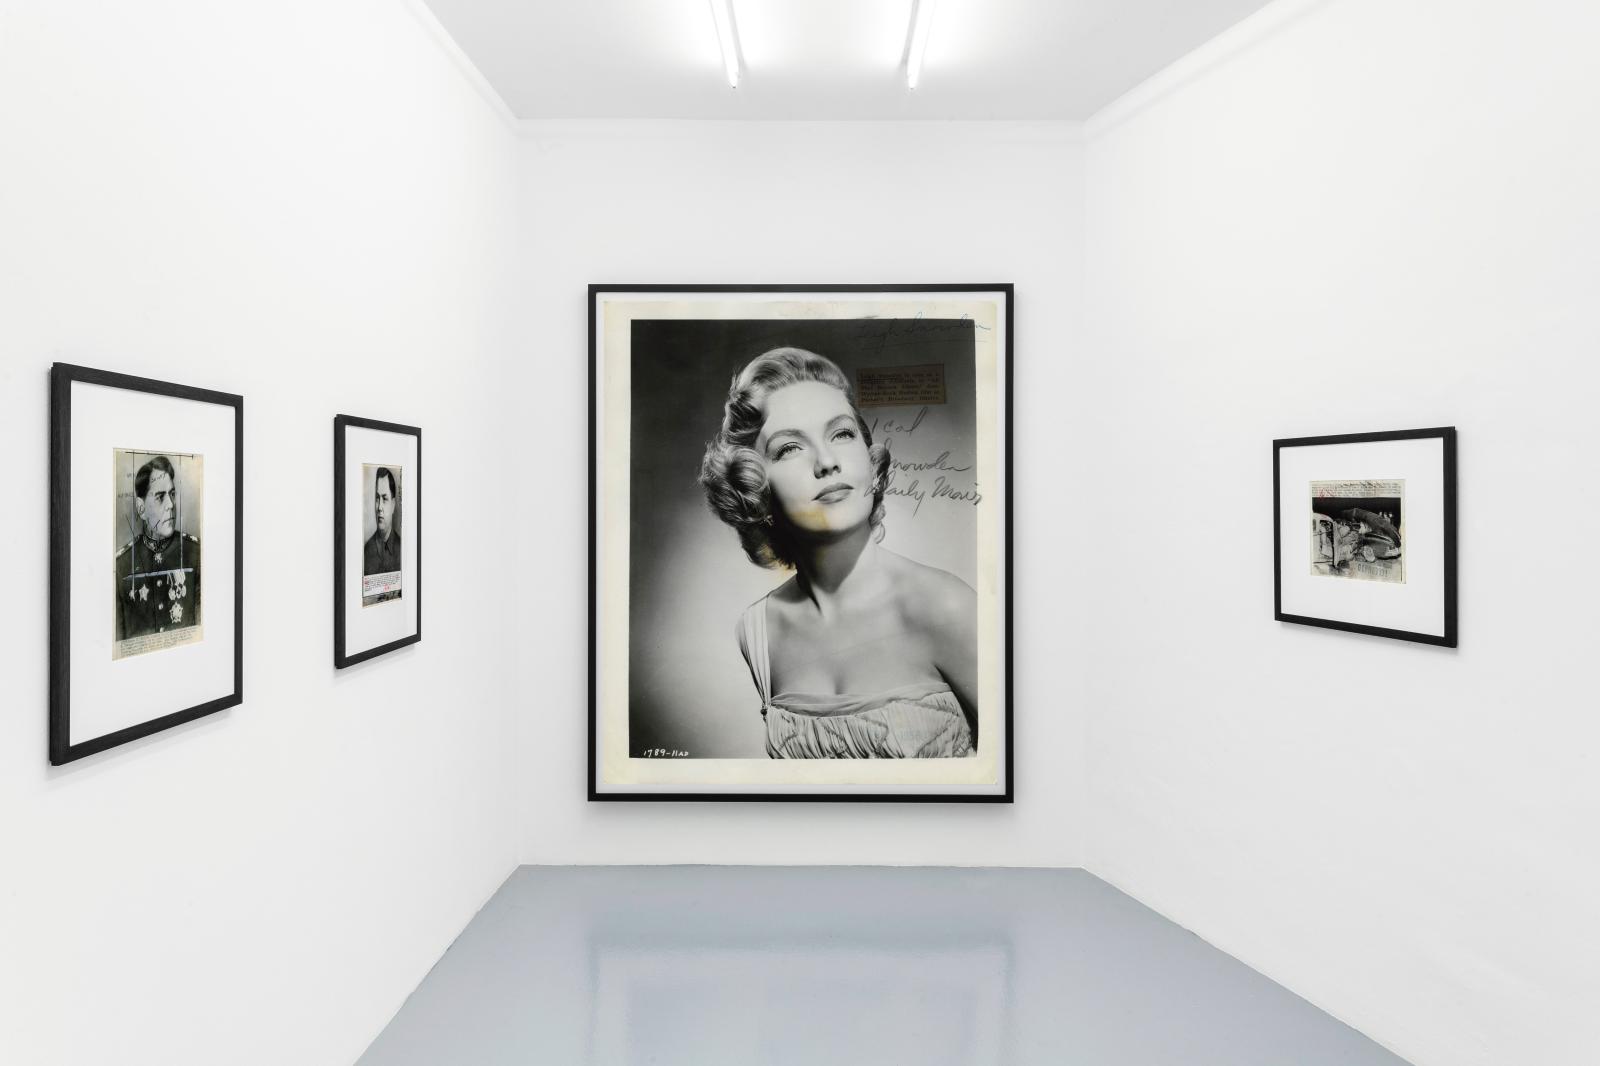 Vue de l'expostion «Thomas Ruff : From the Press» à la galerie Mai 36.